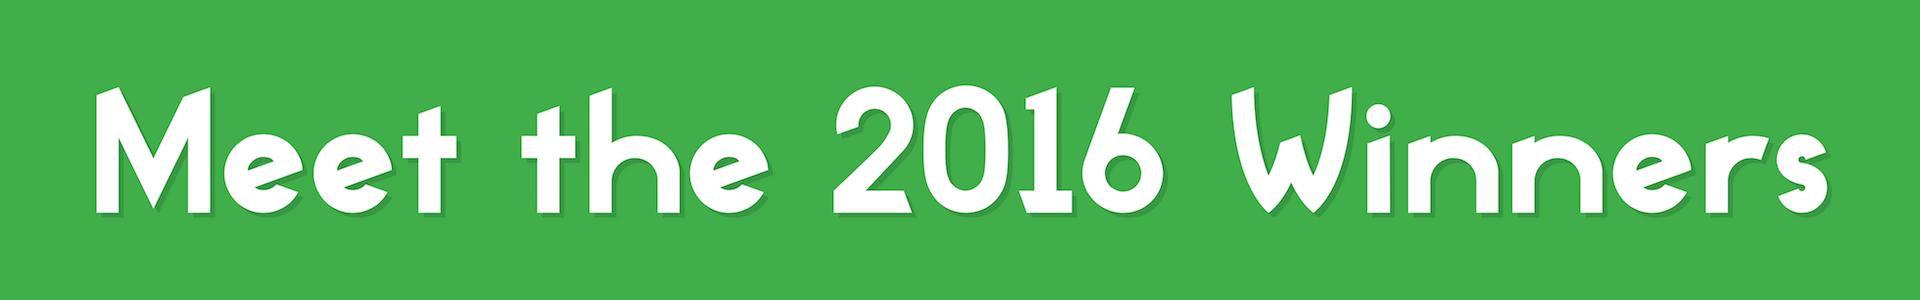 Meet the 2016 Winners